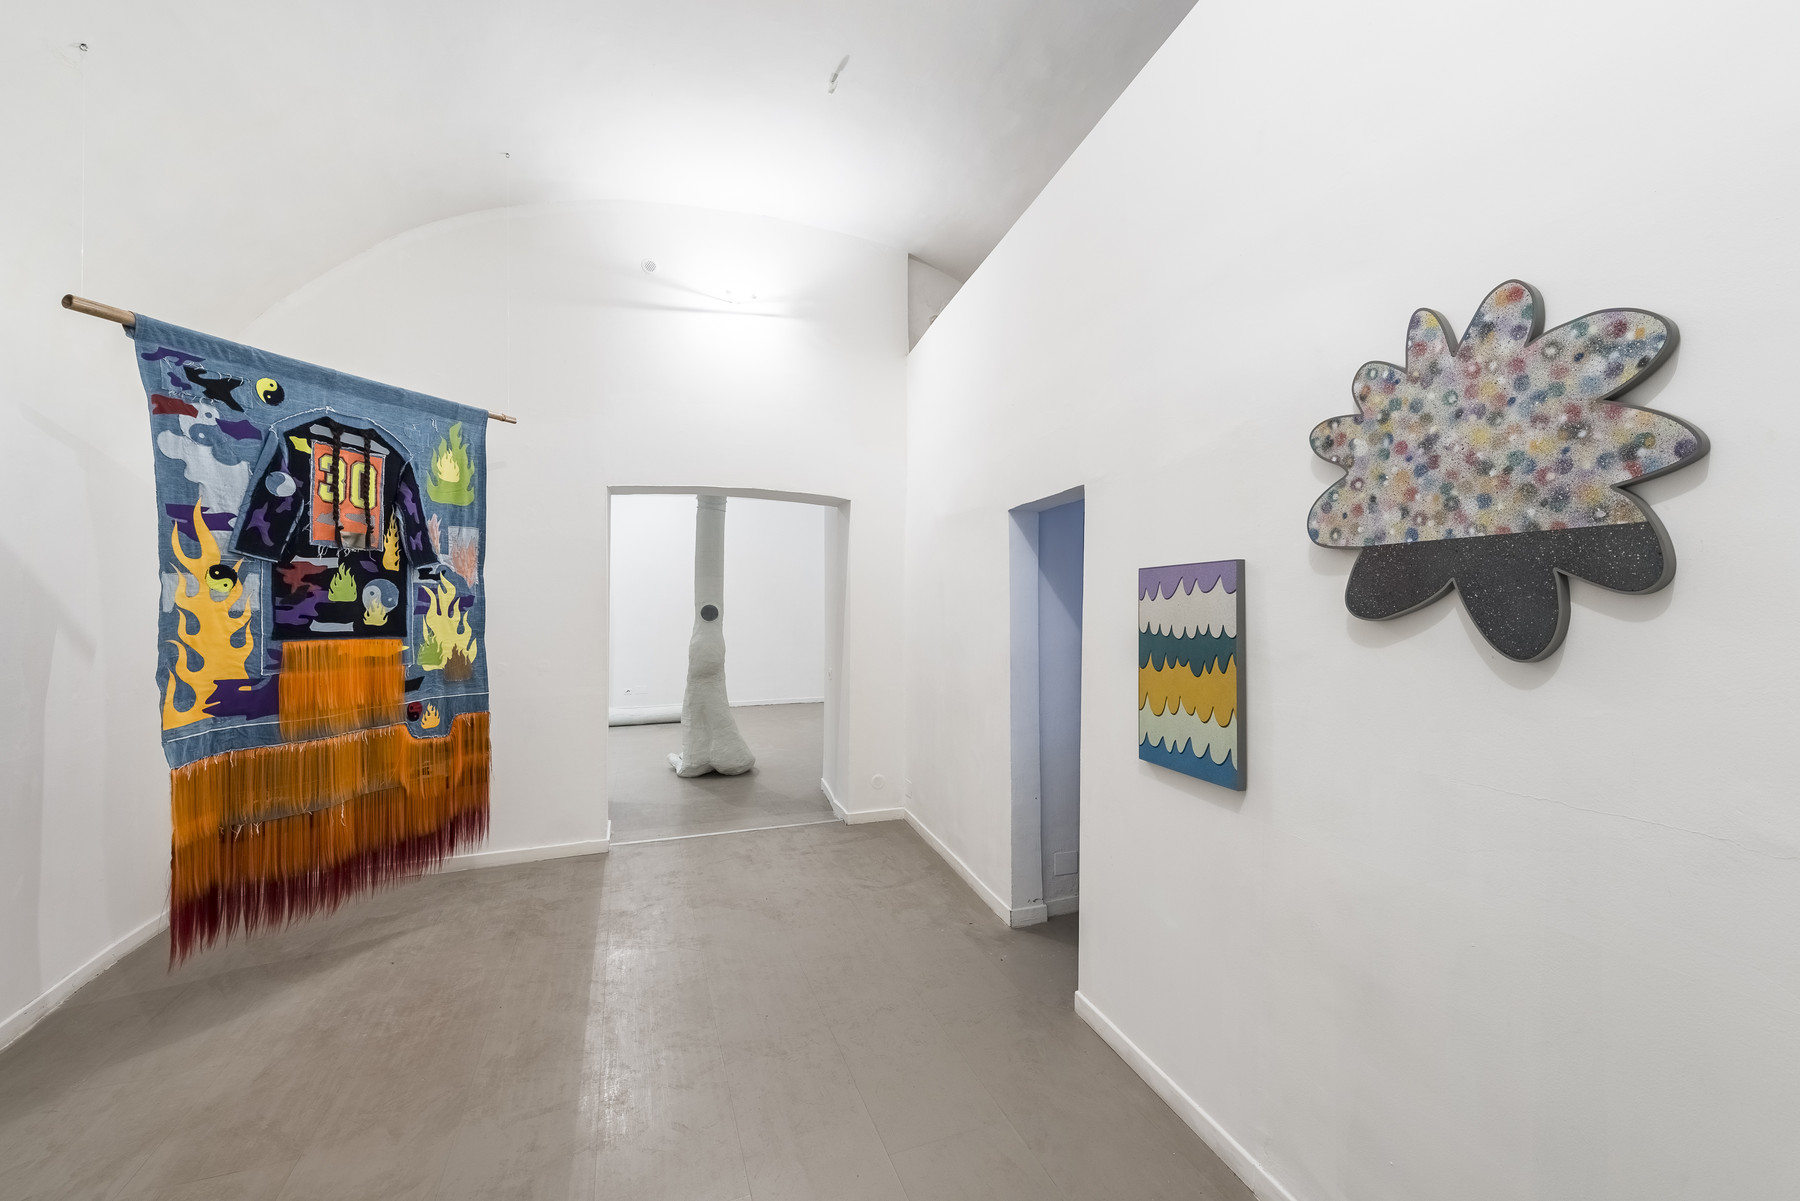 04_Walled Garden In An Insane Eden_2017_Installation View_Room2_z2oSaraZaninGallery_Roma